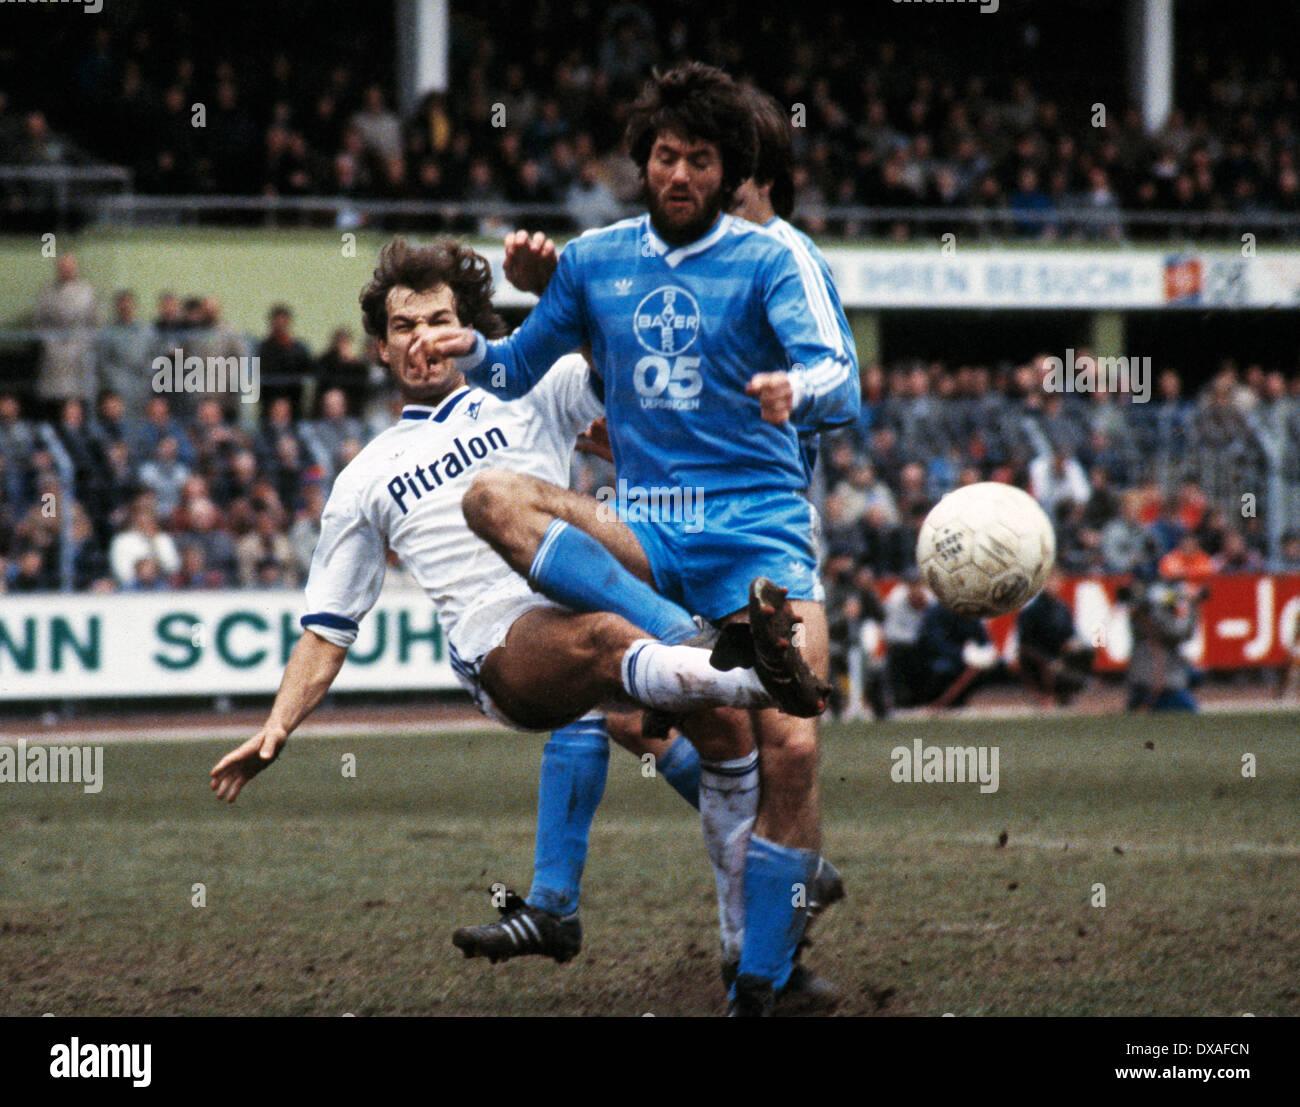 football, Bundesliga, 1984/1985, Grotenburg Stadium, FC Bayer 05 Uerdingen versus SV Waldhof Mannheim 2:2, scene of the match, tackling of Dieter Schlindwein (SVW) against Friedhelm Funkel (Bayer) - Stock Image